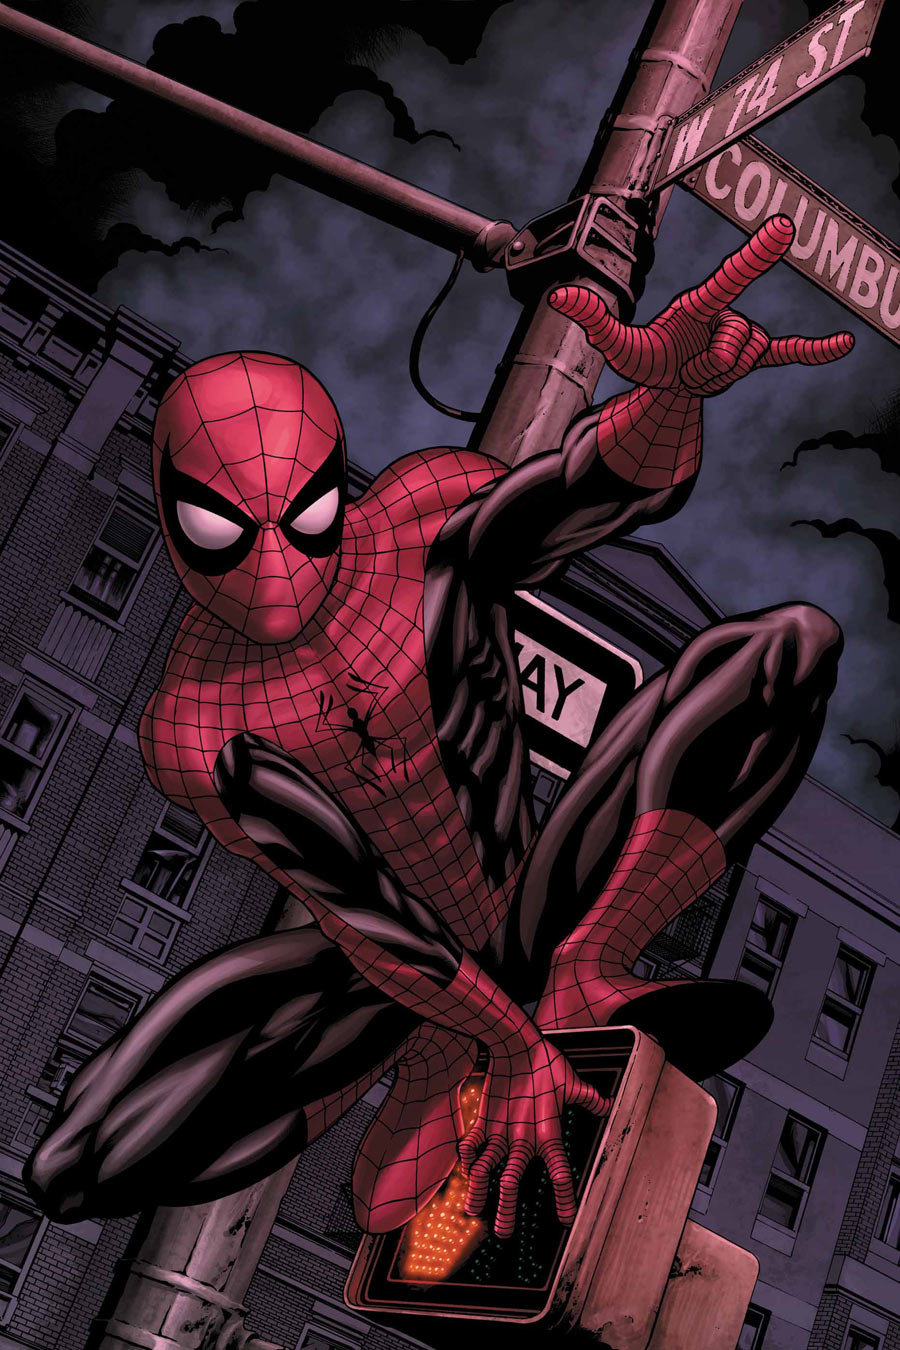 https://vignette.wikia.nocookie.net/marveldatabase/images/7/76/Web_of_Spider-Man_Vol_1_129.1_Textless.jpg